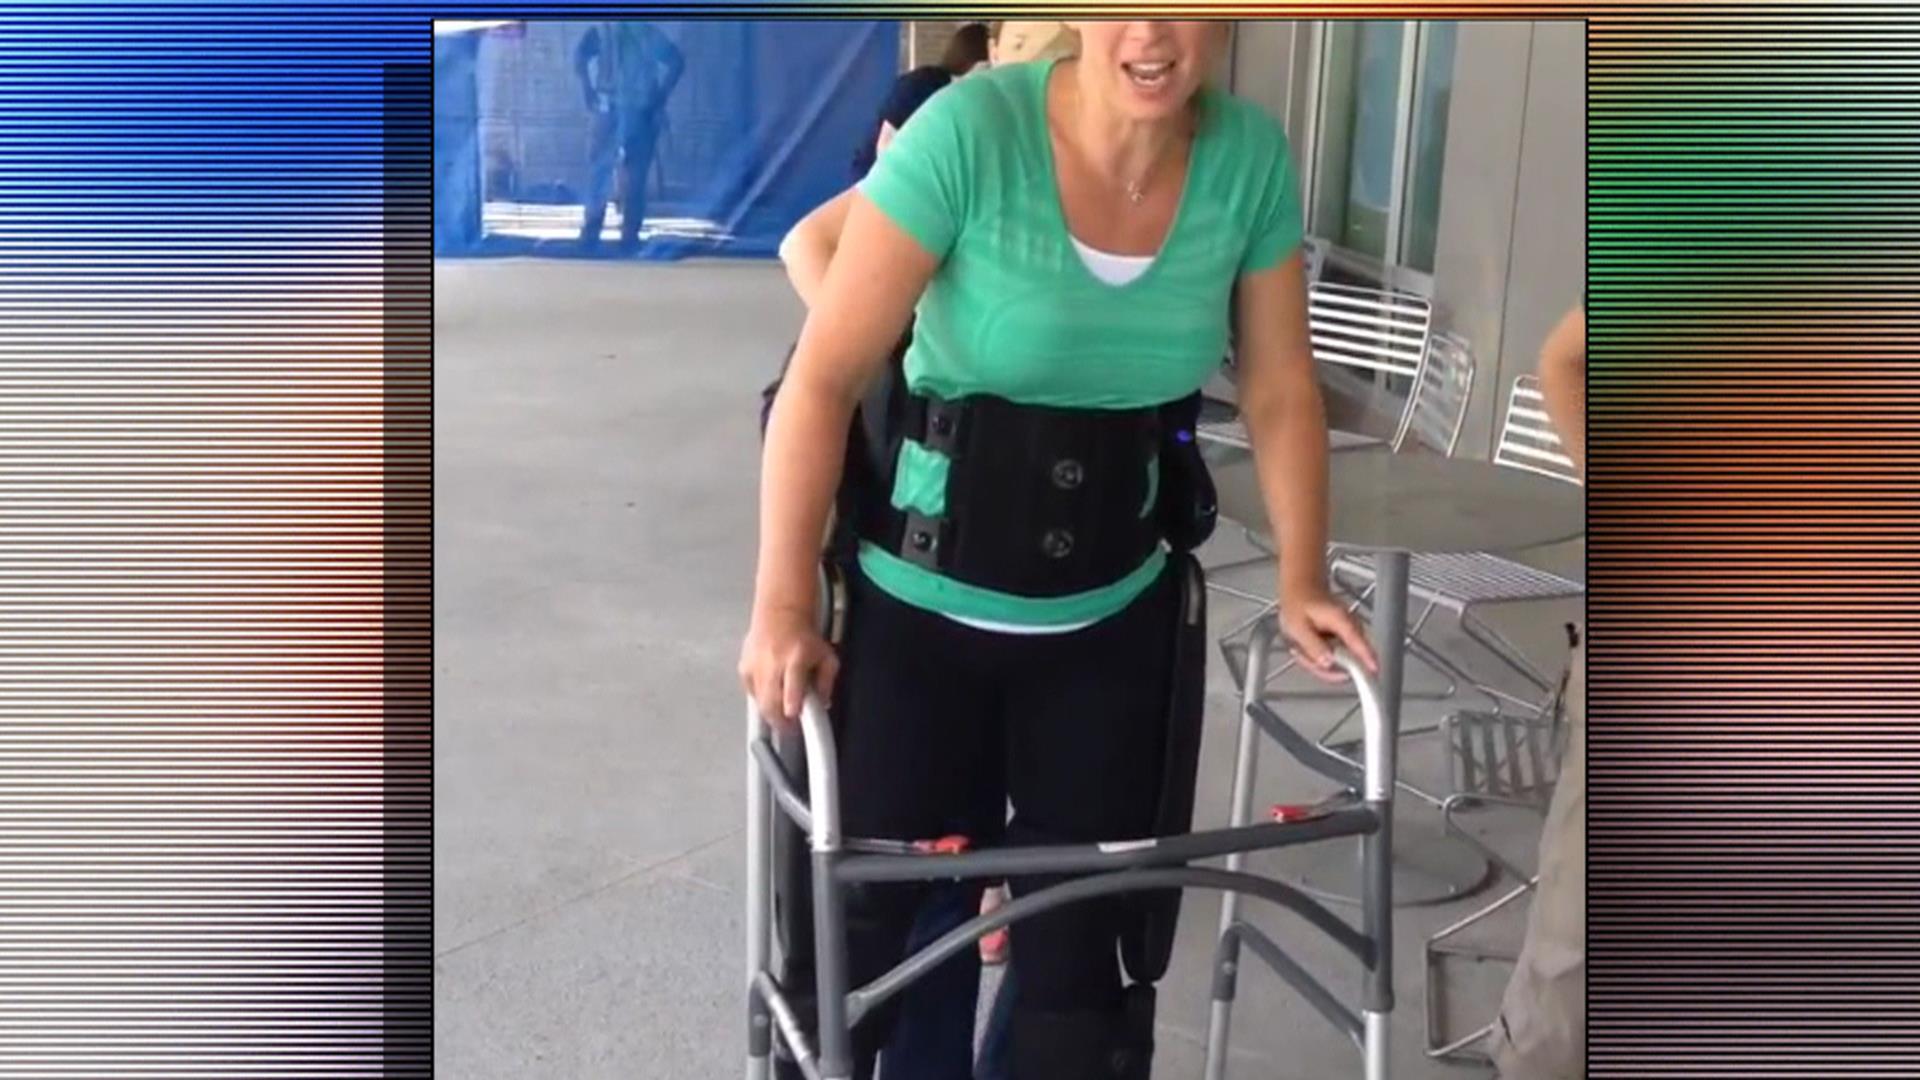 Paralyzed Amy Van Dyken-Rouen Takes First Steps